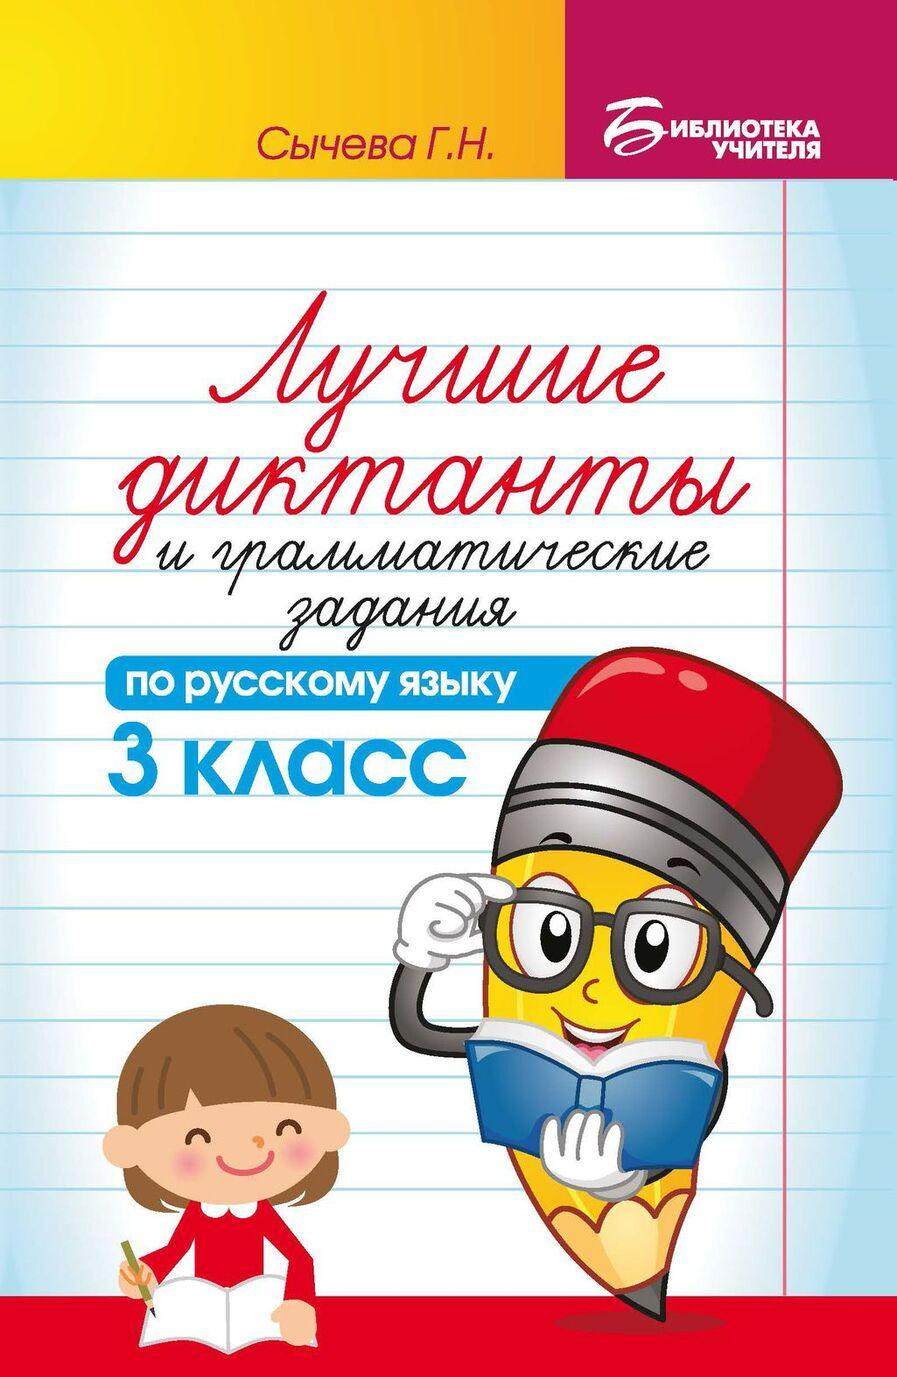 Luchshie diktanty i grammat.zadanija po rus.jaz.3 kl.d